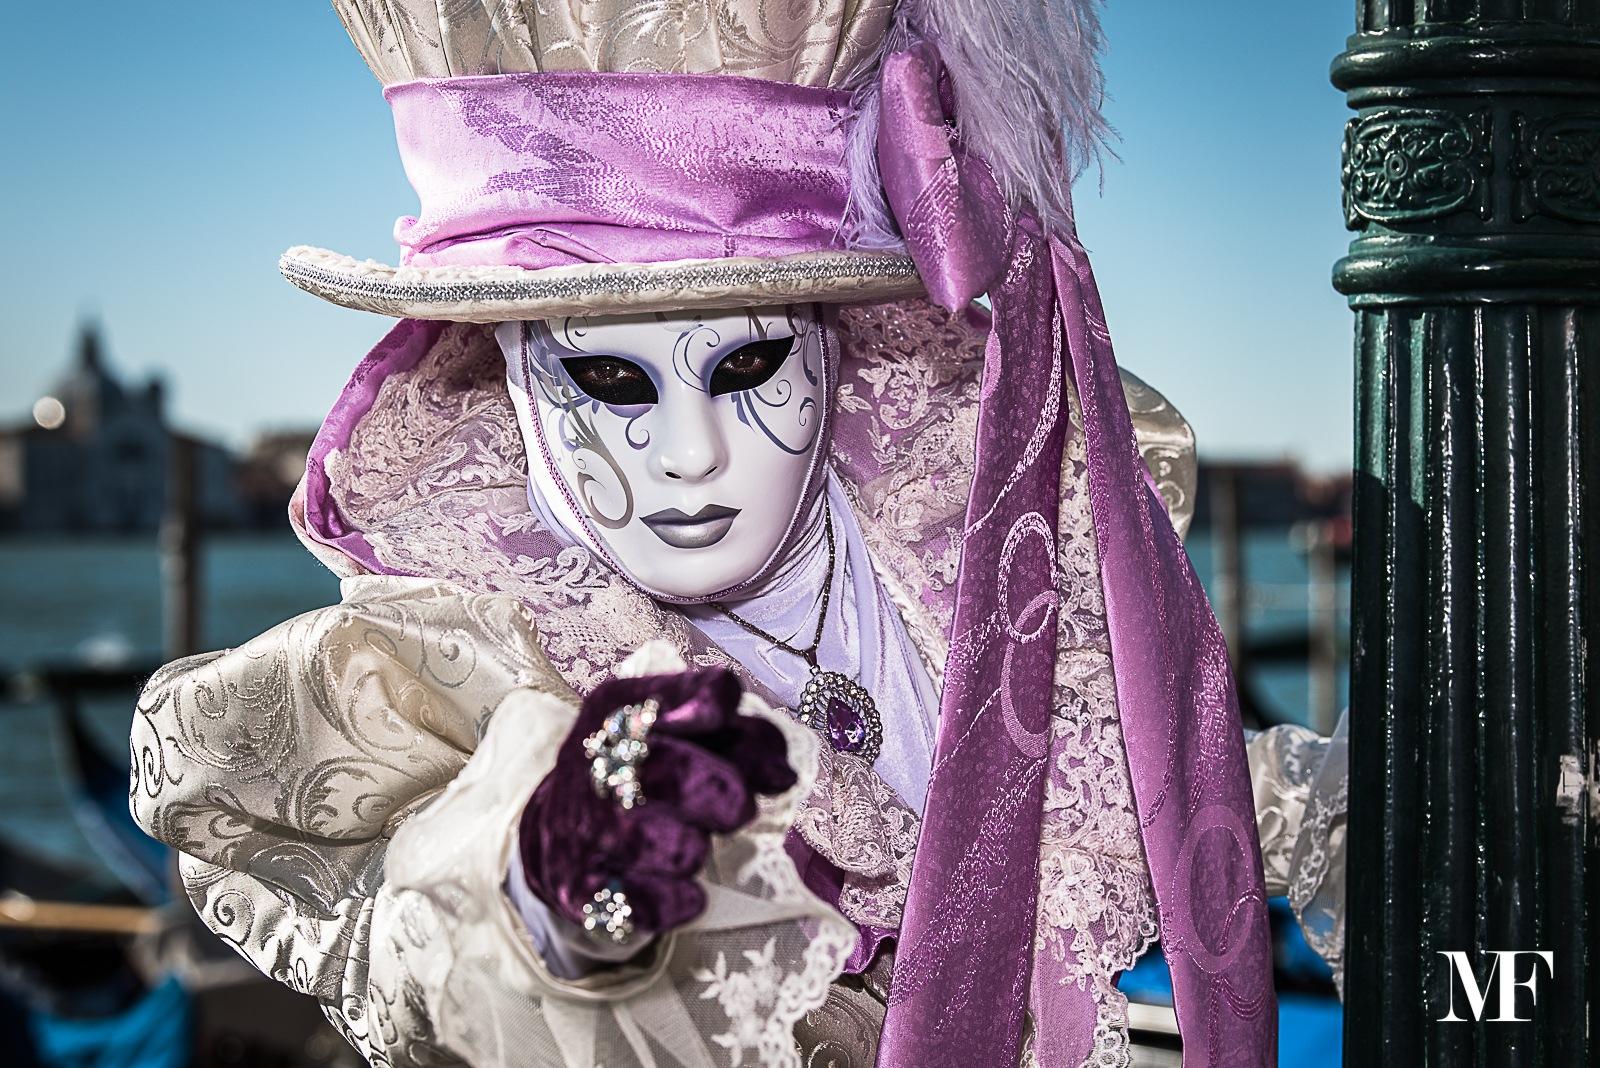 Carnival 2017 - you by moreno faina